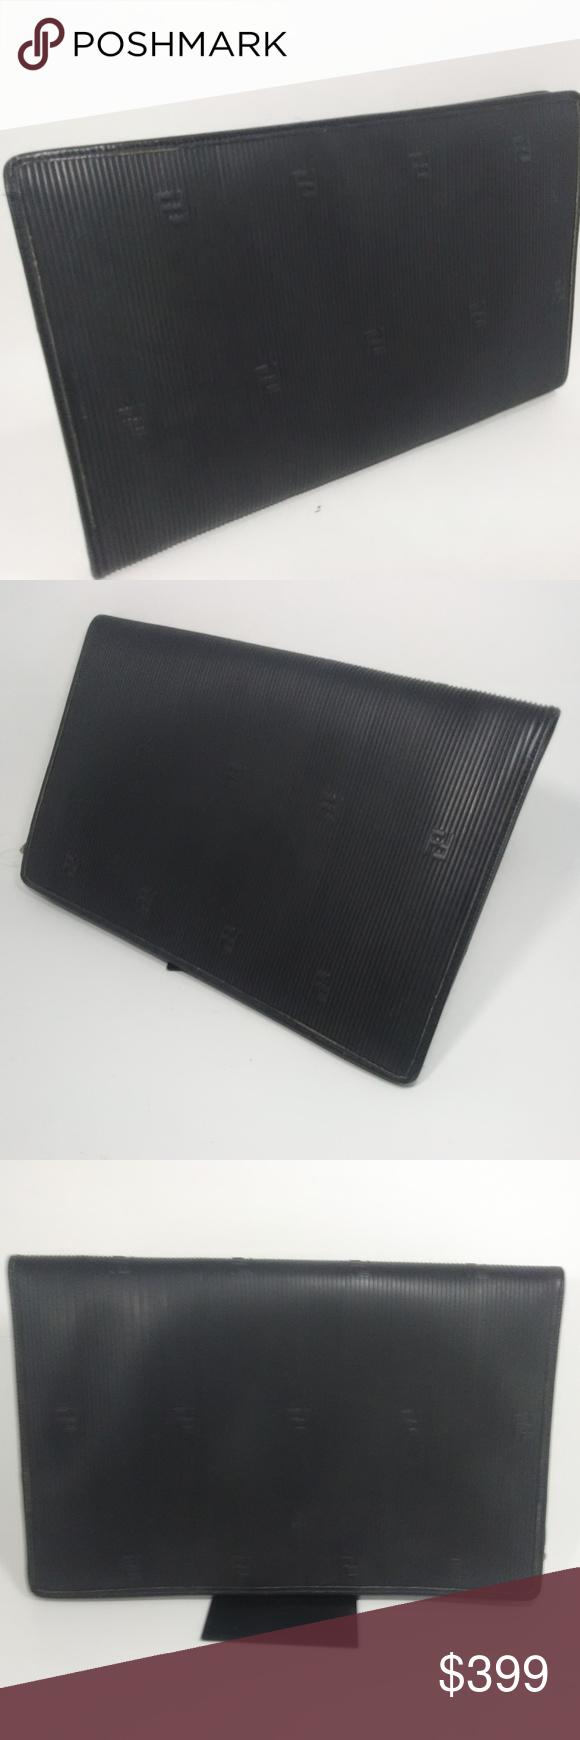 18d41d3f3e97 FENDI ROMA Vintage Black Portfolio Striped Clutch FENDI ROMA Italy 1925  S.A.S Portfolio Case 10